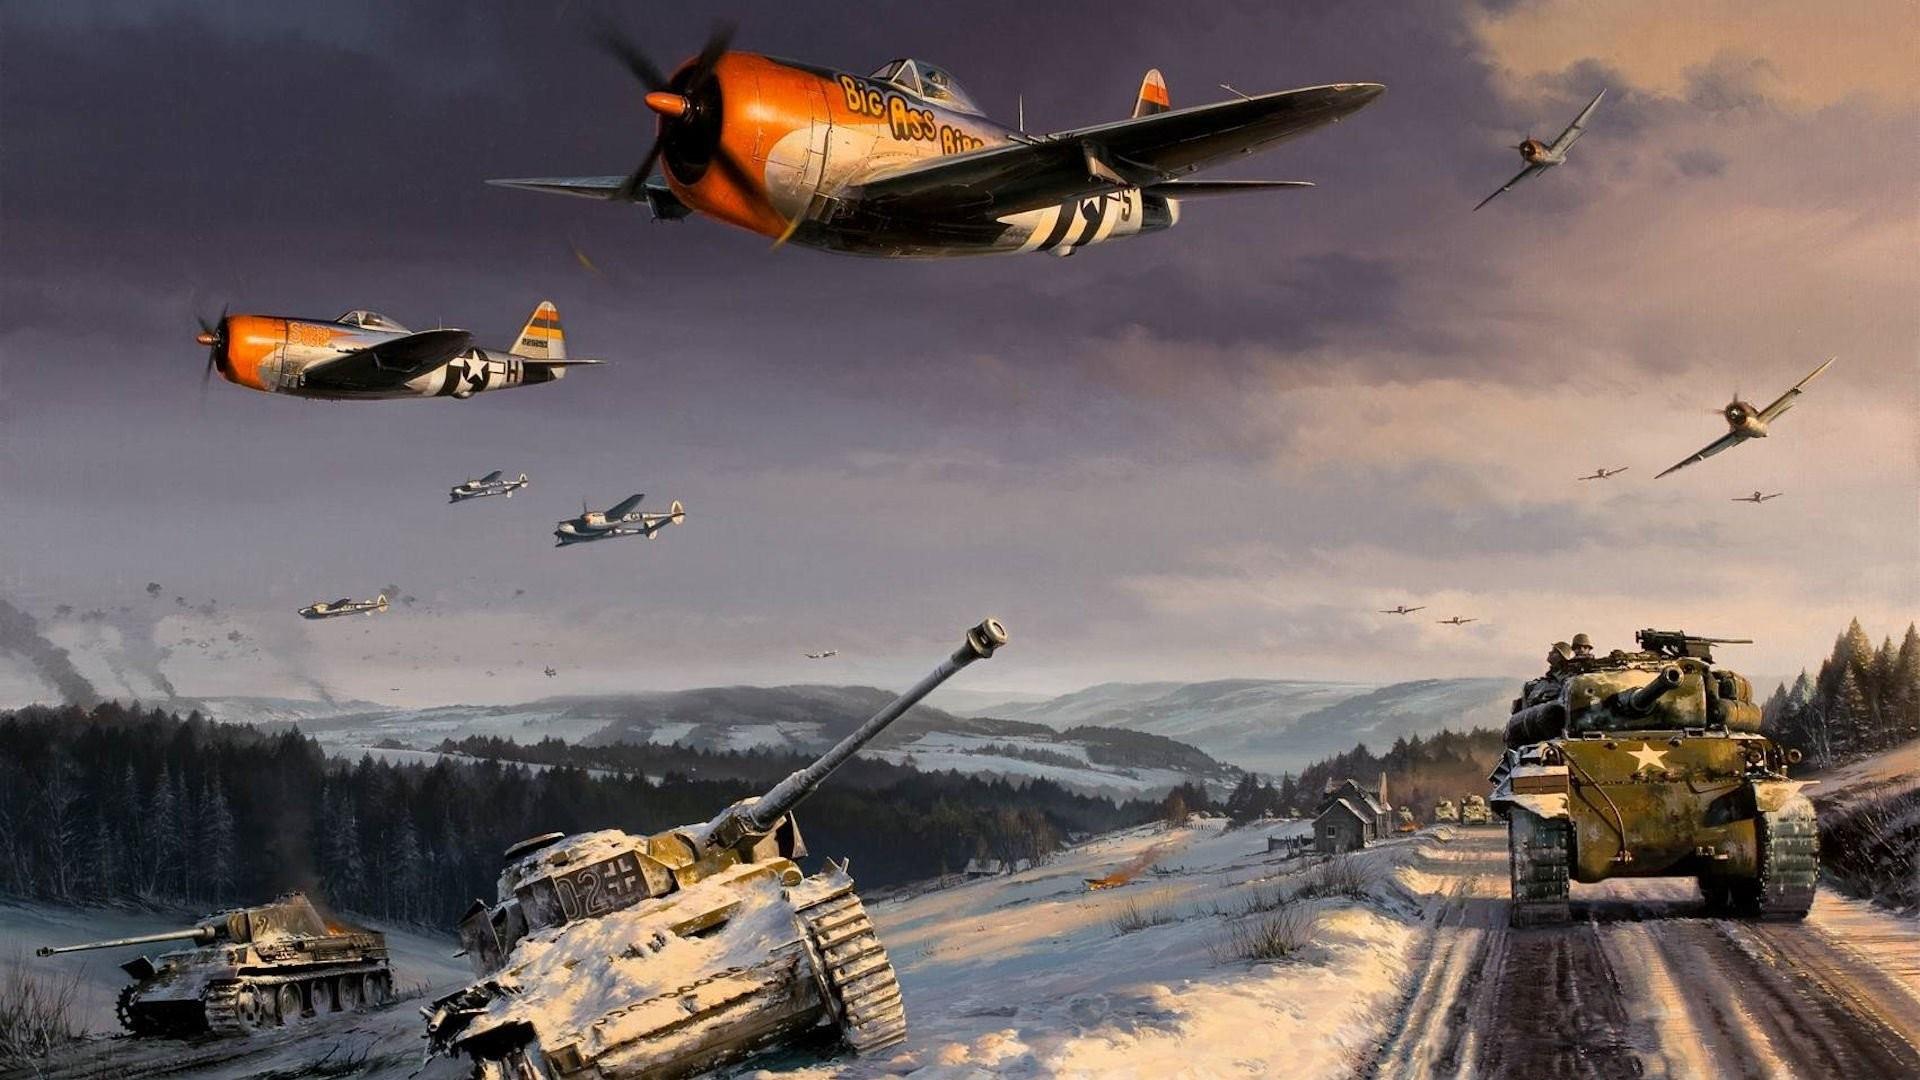 p47 thunderbolt p38 lightning world war ii battle of the ardennes sherman  art picture